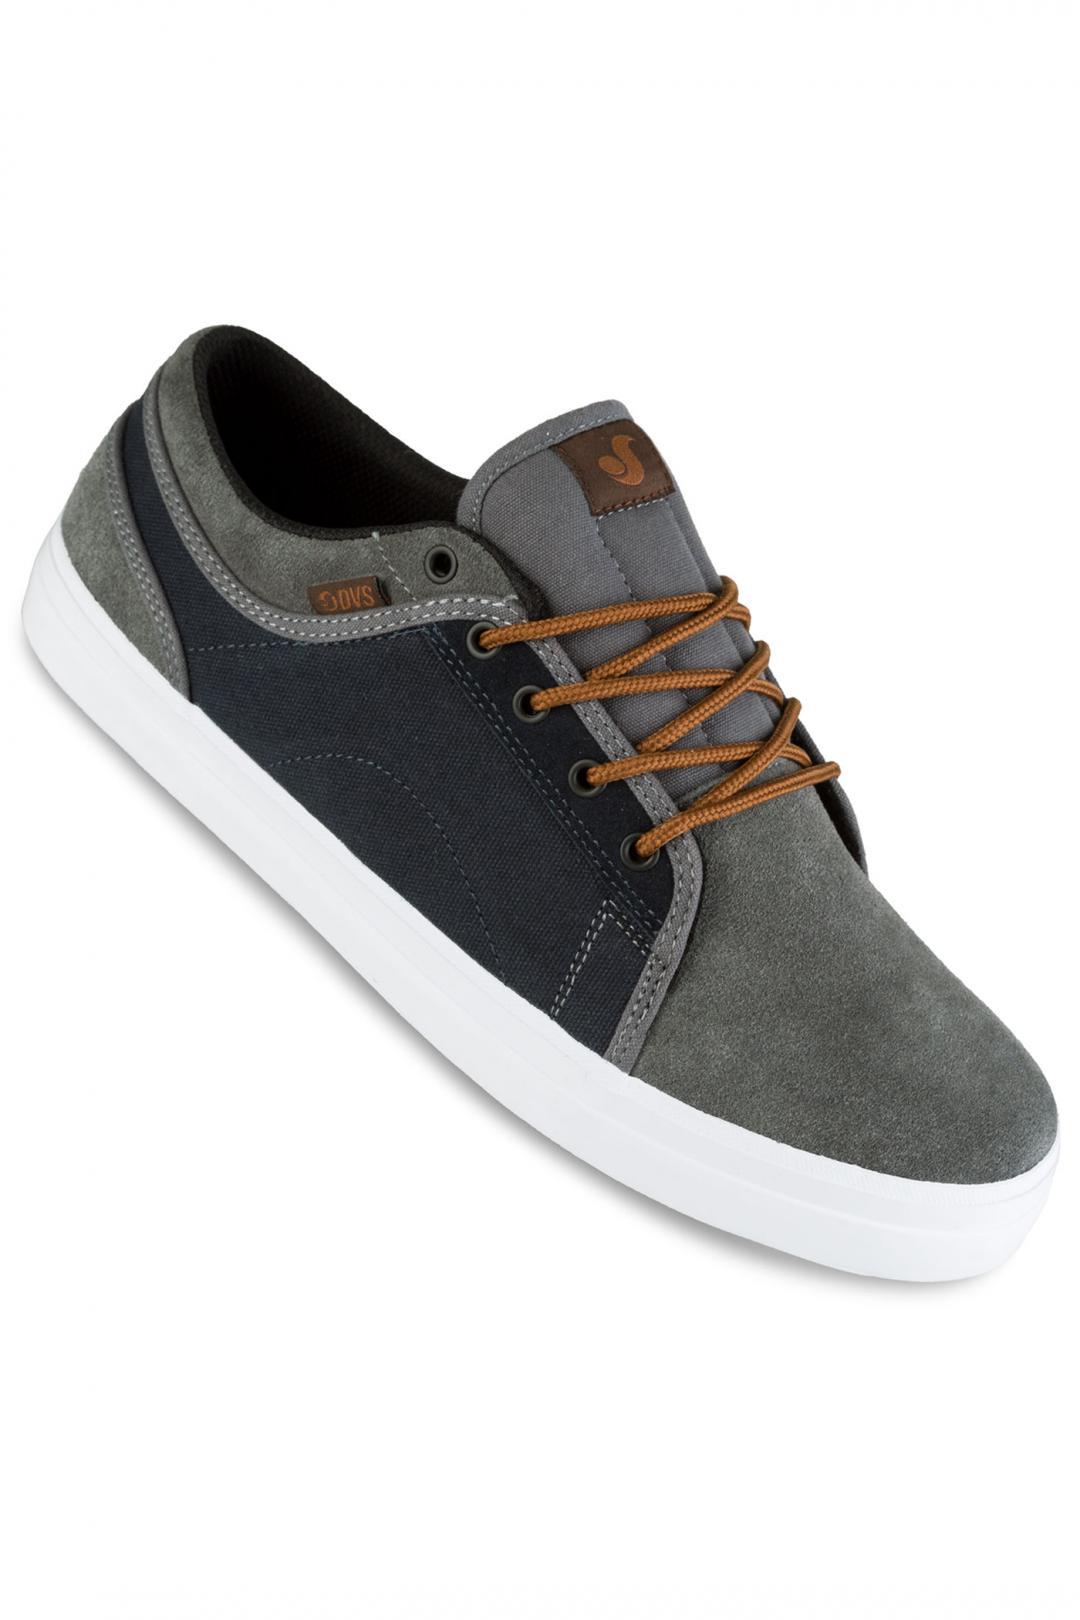 Uomo DVS Aversa Suede grey blue | Sneaker